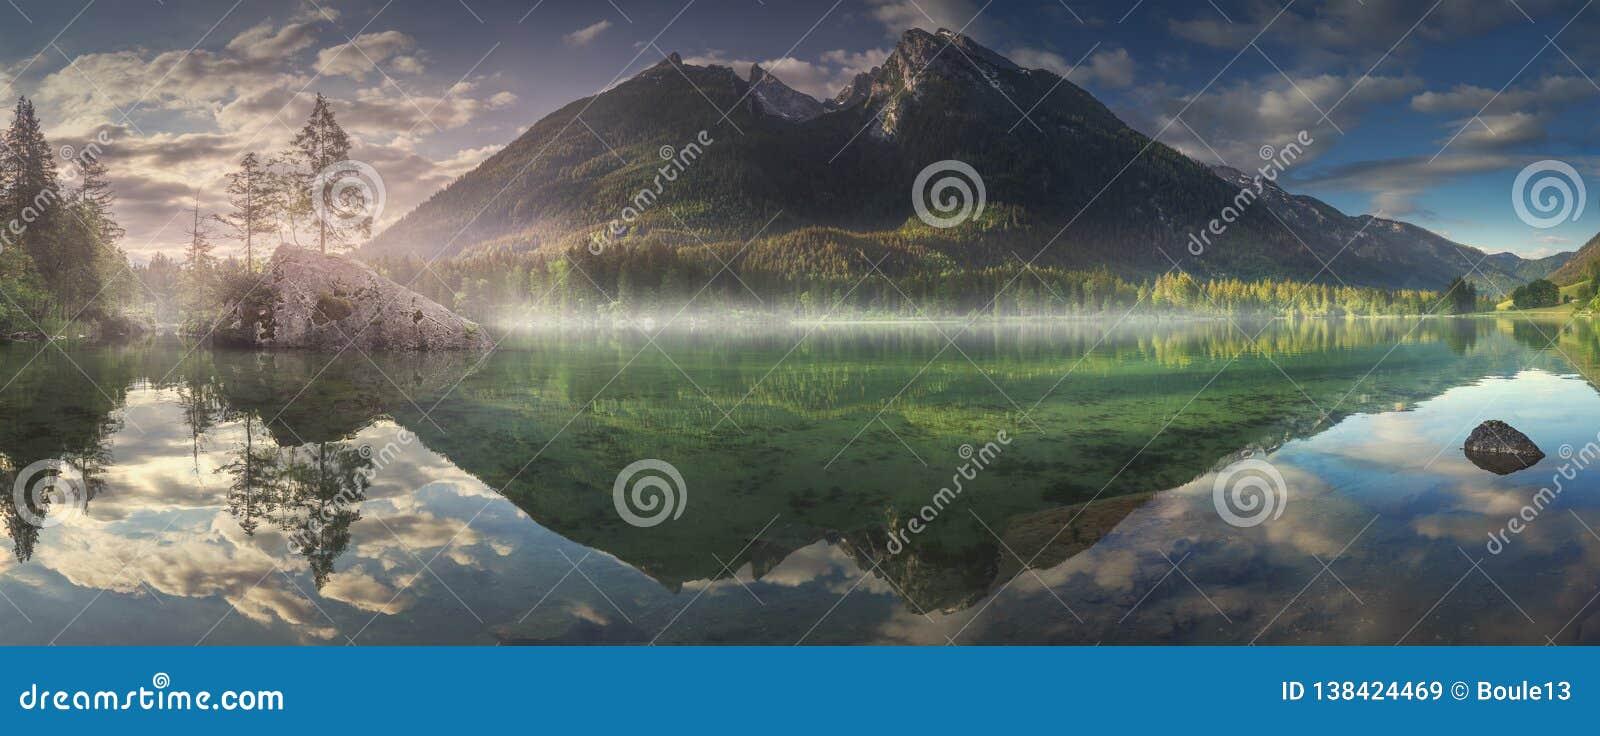 Mening van Hintersee-meer in Beierse Alpen, Duitsland